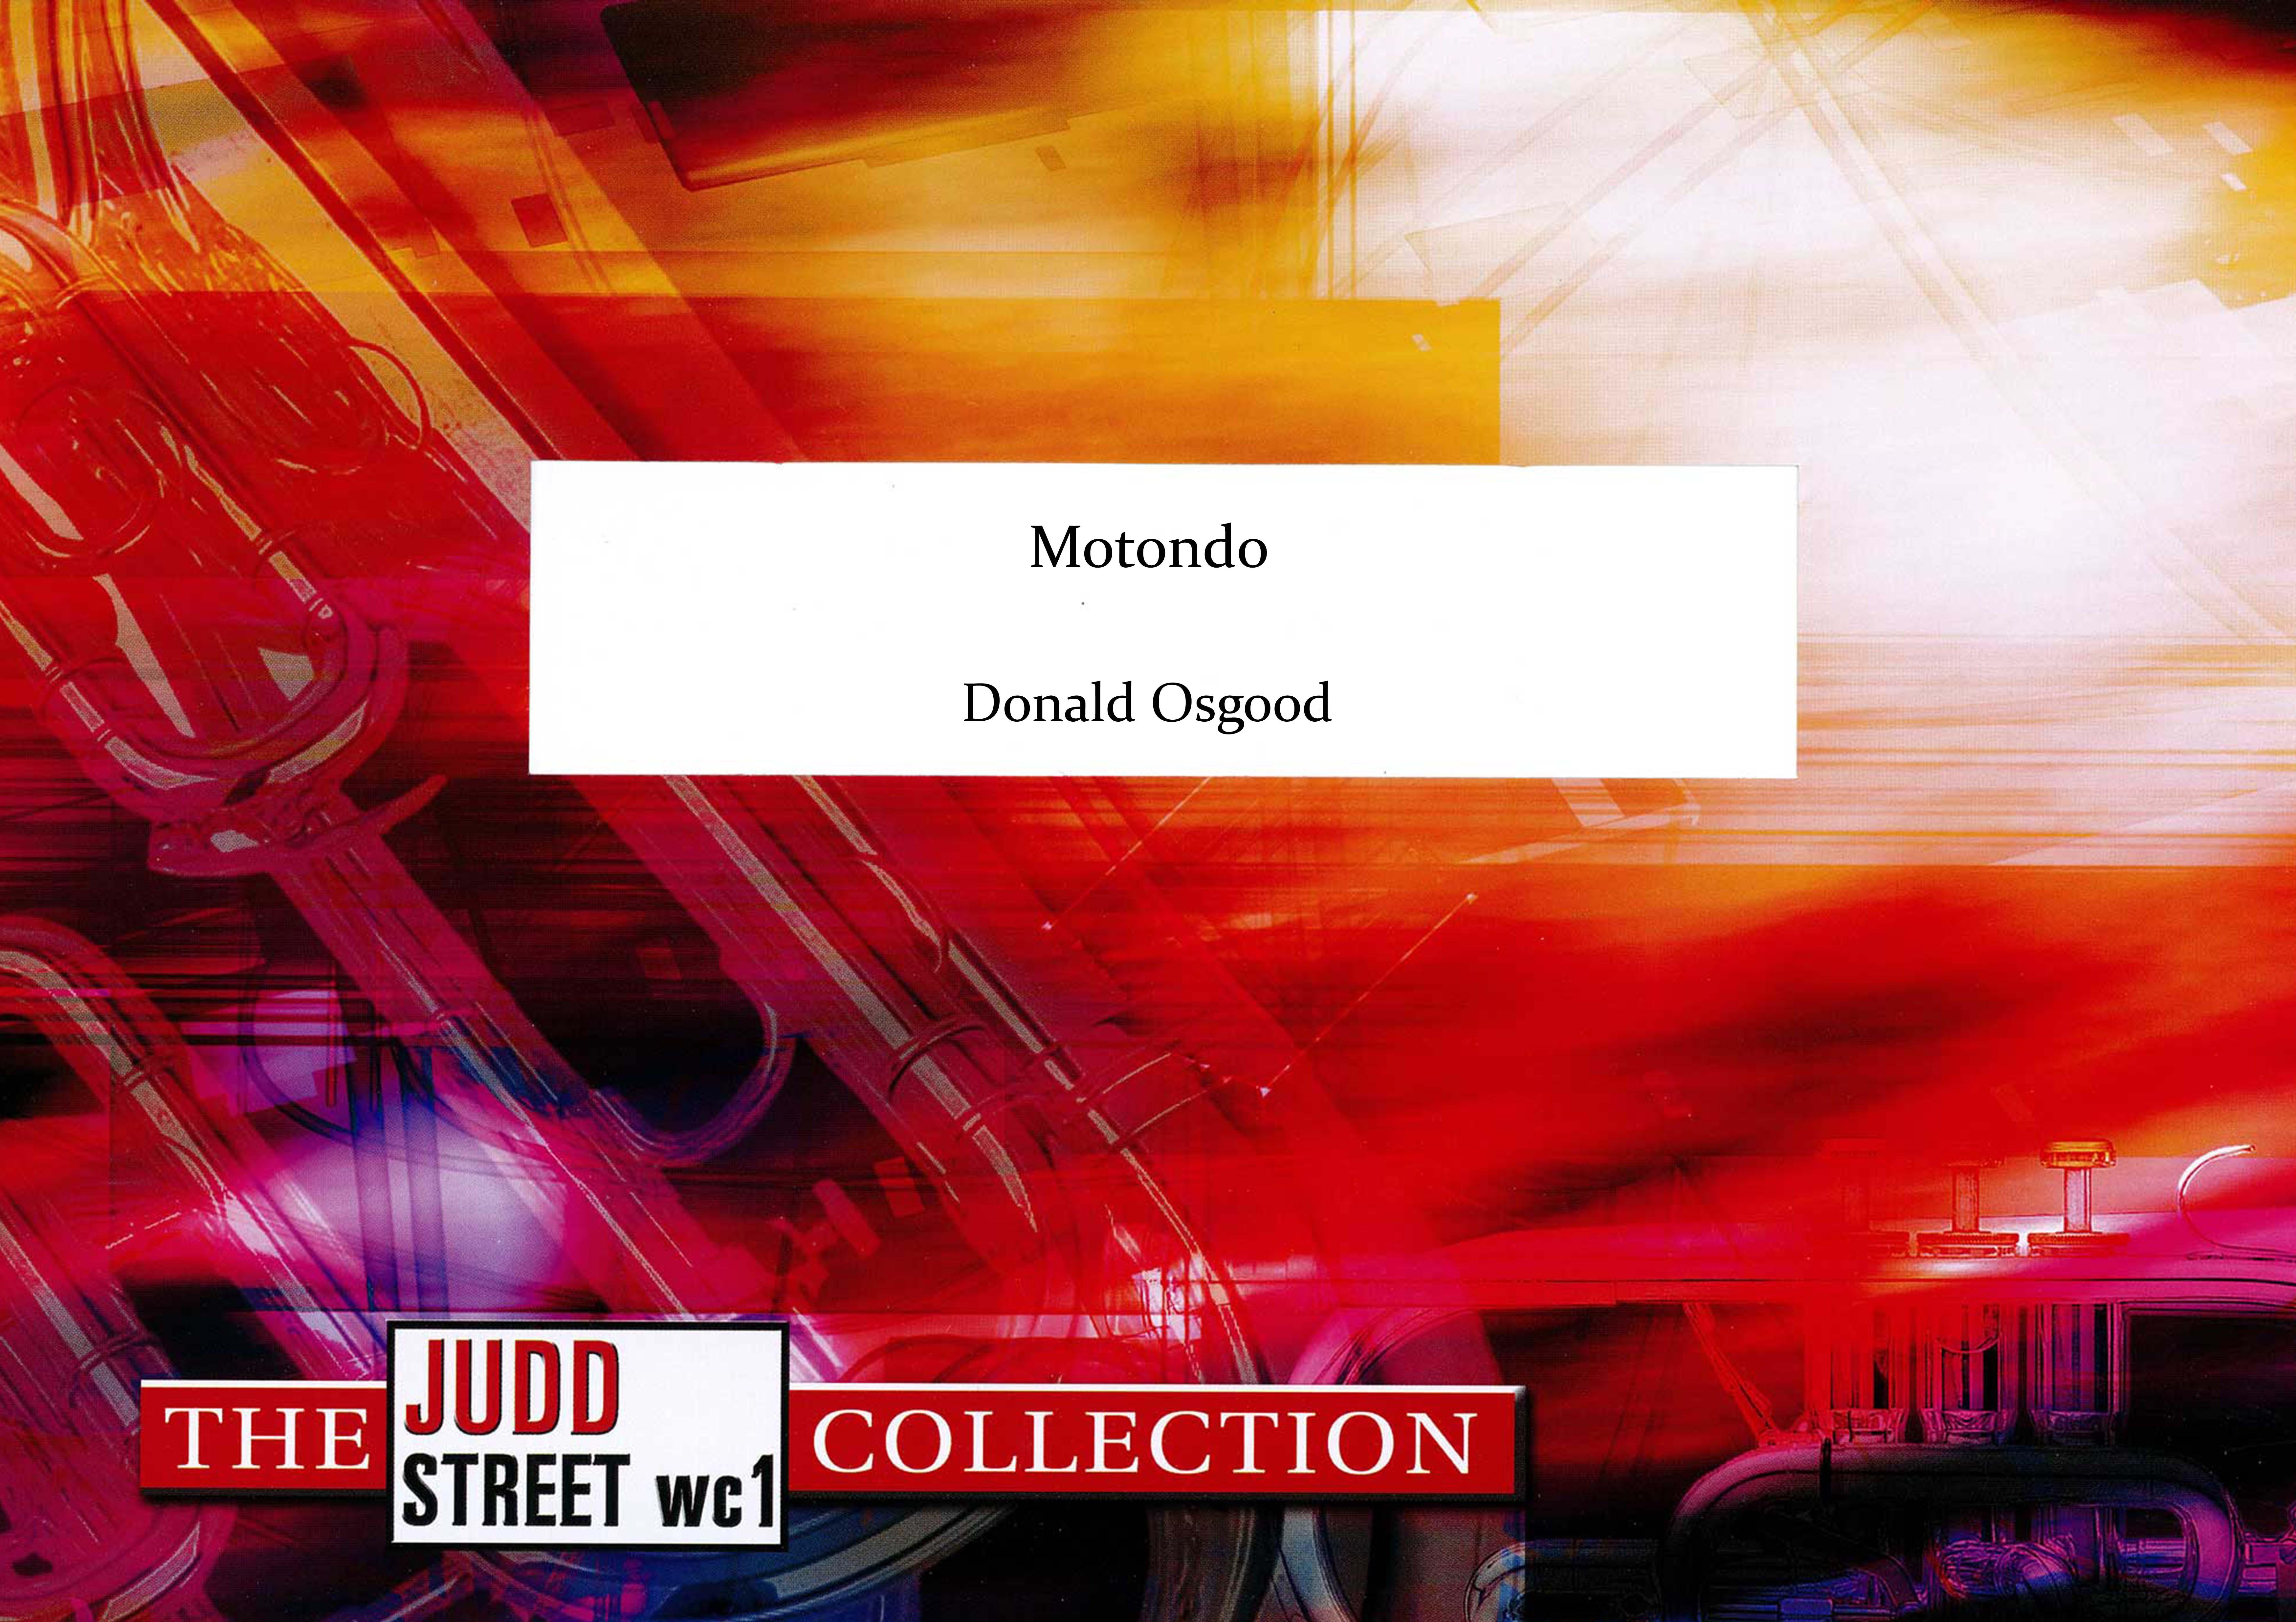 Motondo (Brass Band - Score and Parts)